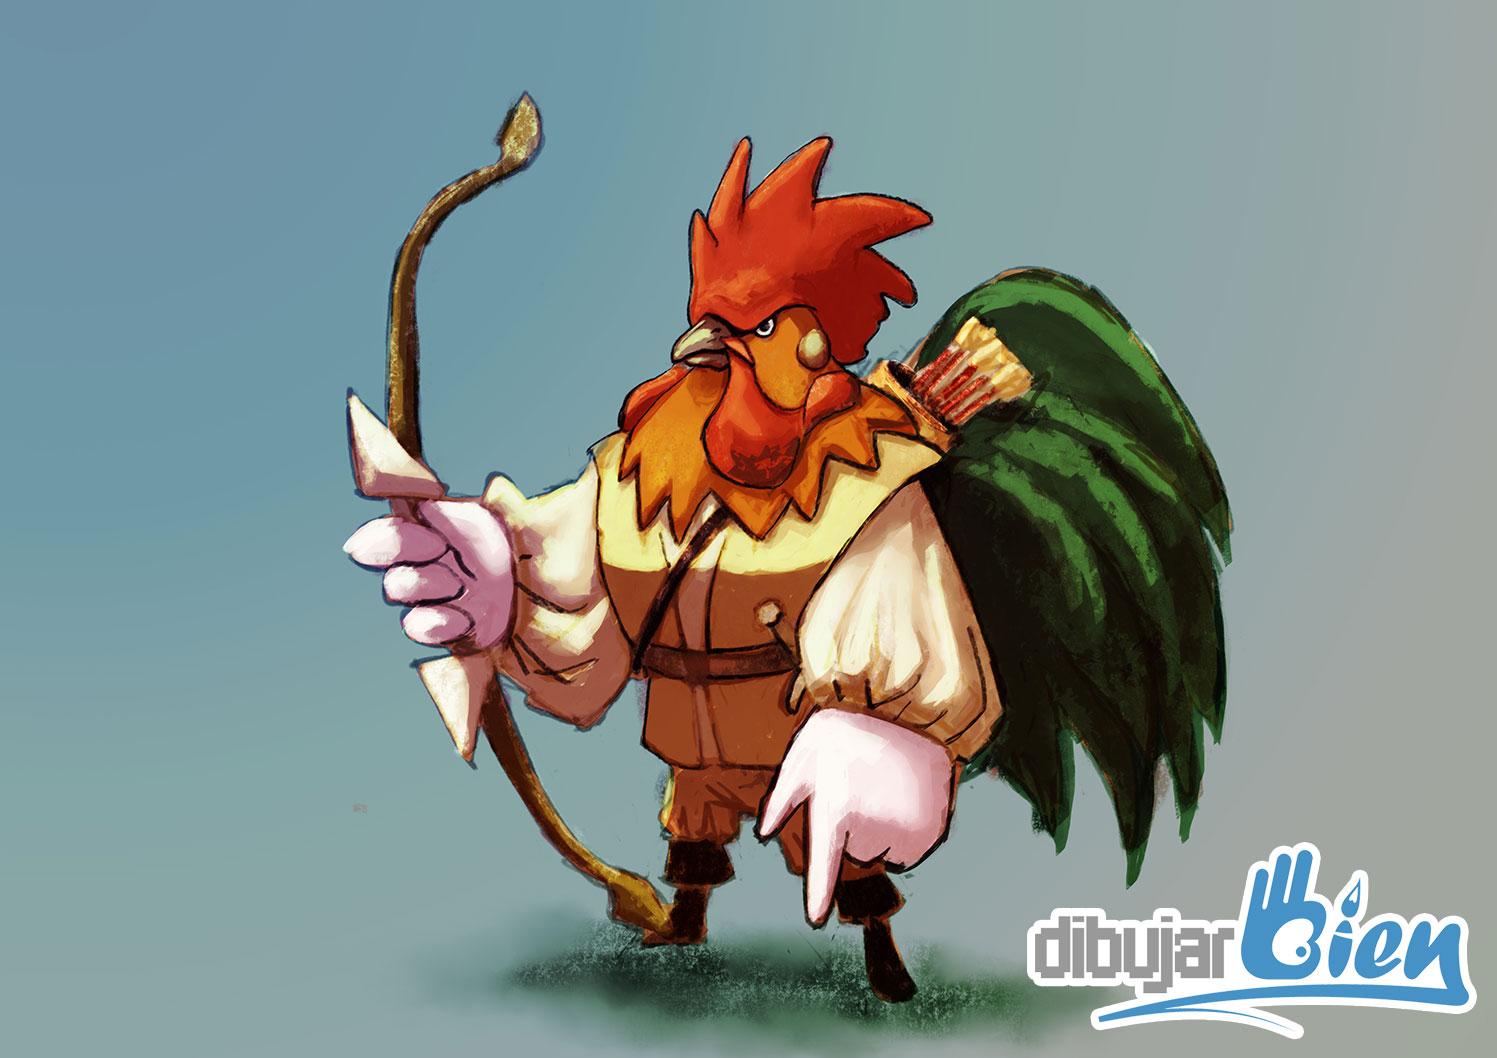 gallo-medieval-arquero - Dibujar Bien